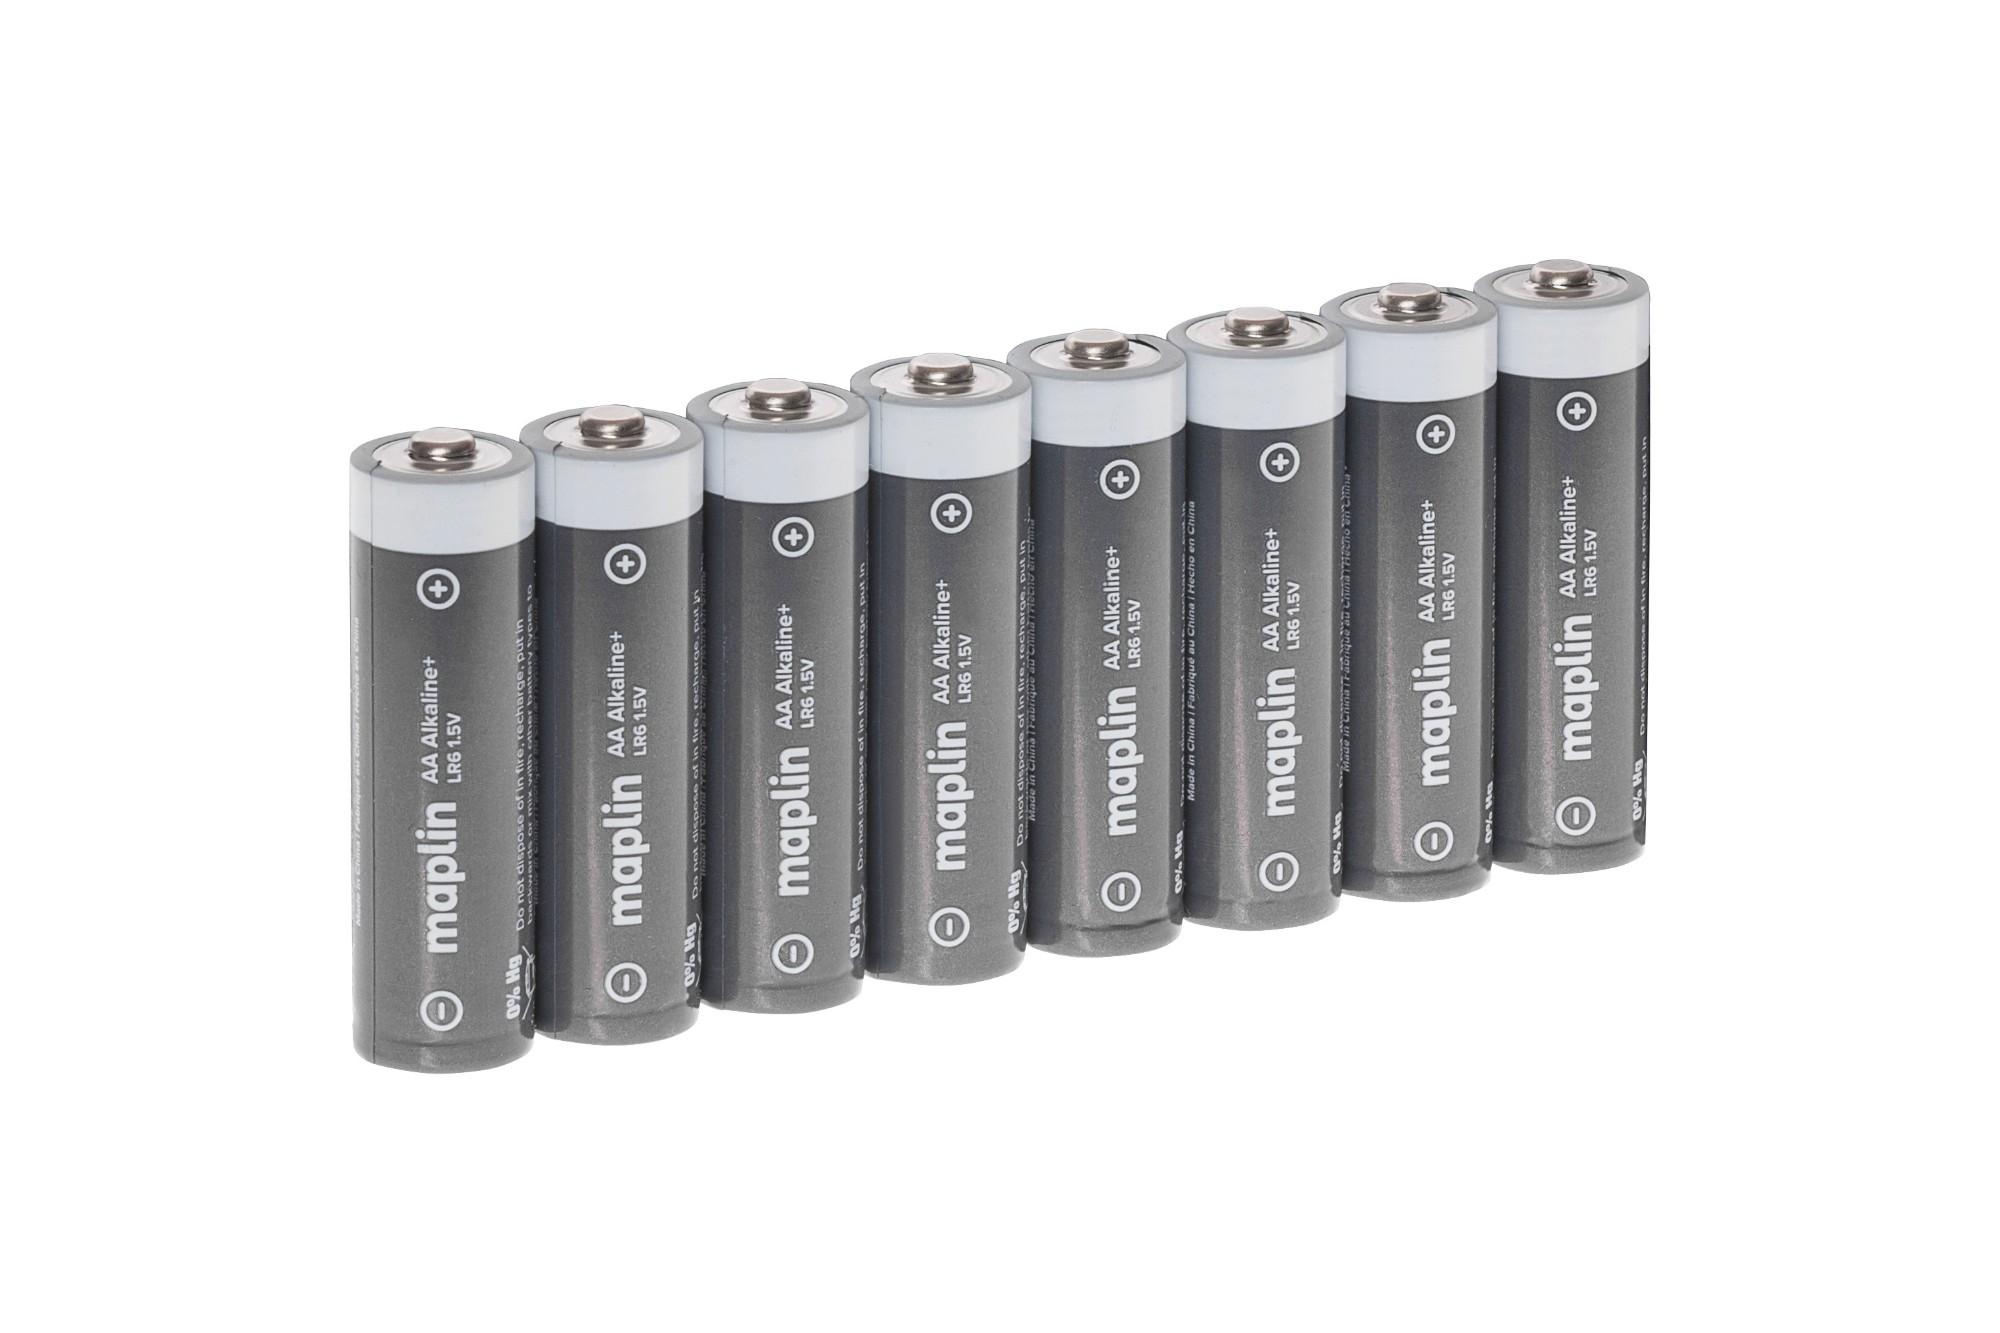 MAPLIN Extra Long Life High-Performance Alkaline AA Batteries - Pack of 8